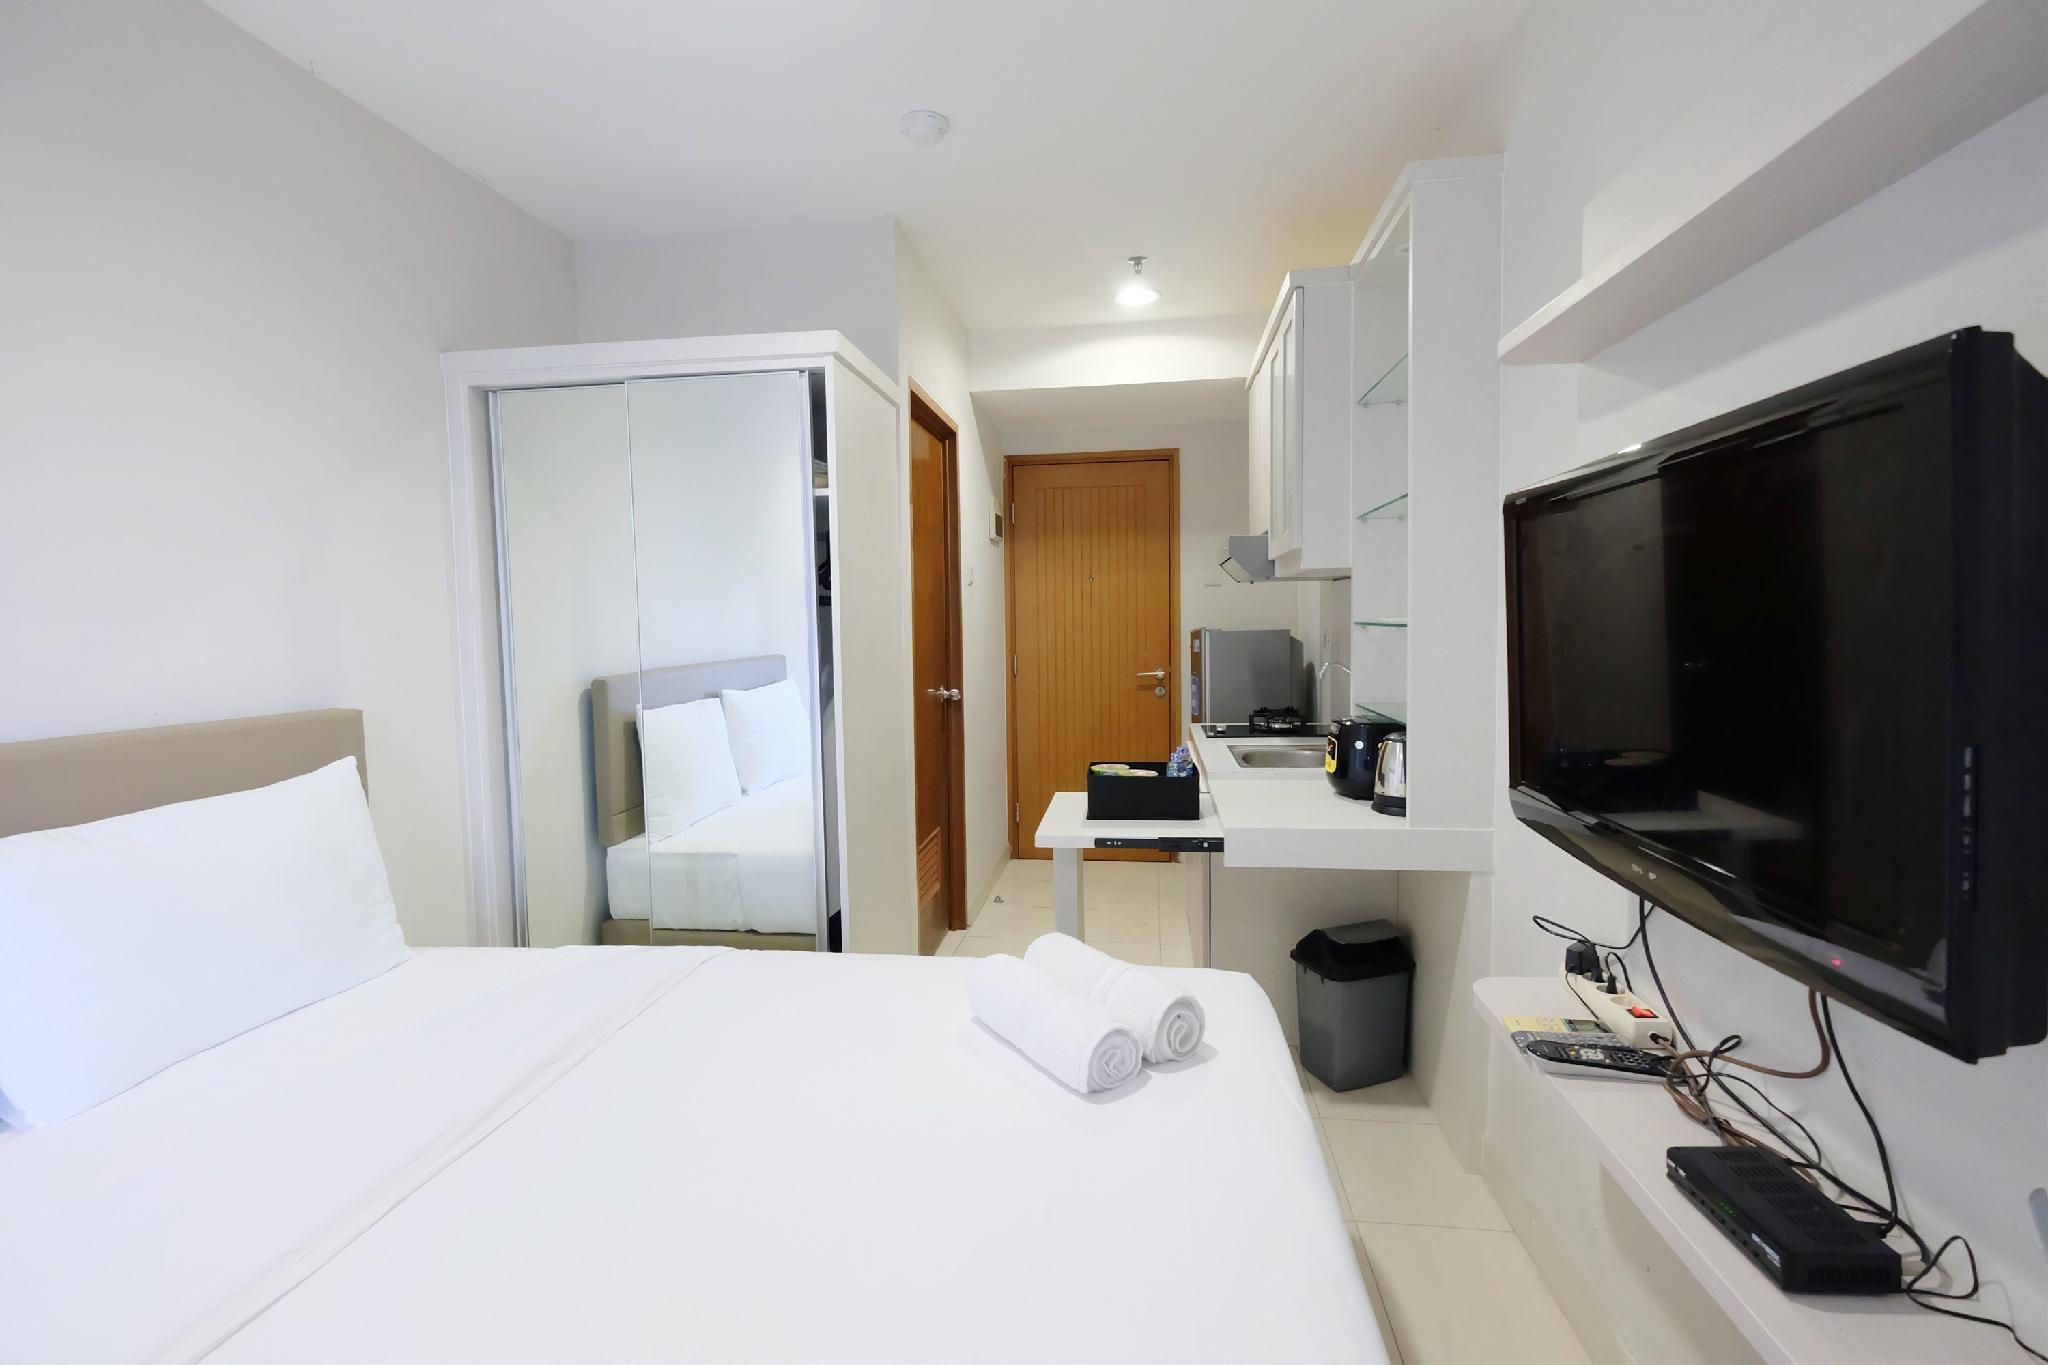 Studio Apt At Cinere Bellevue Suites By Travelio Apartment